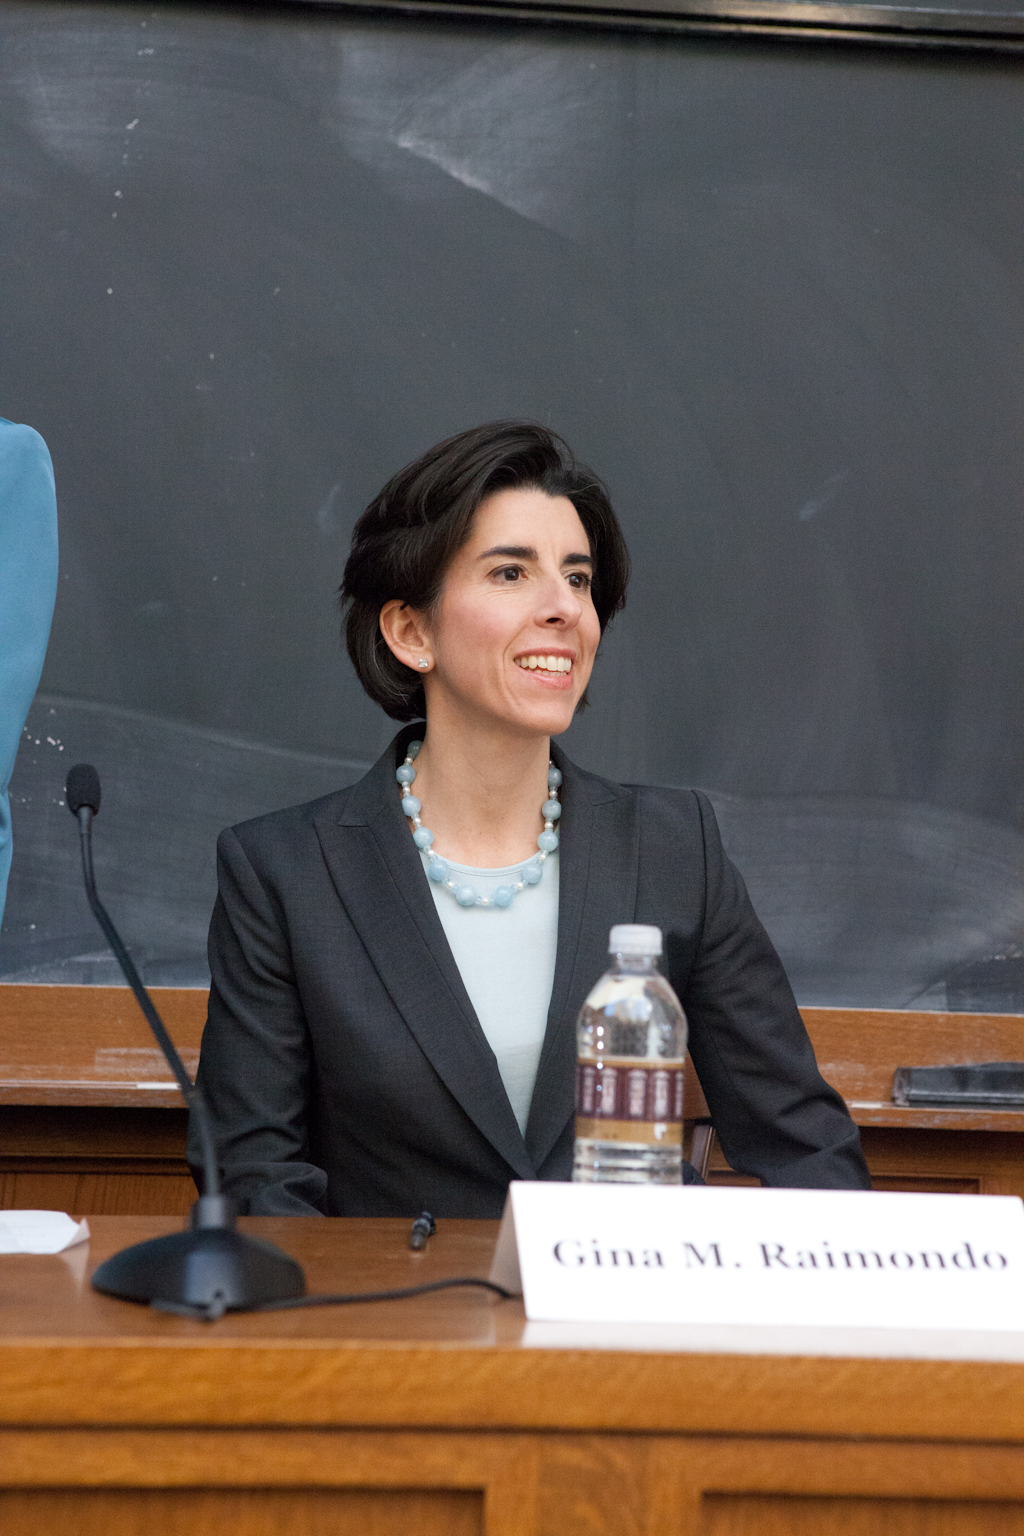 Gina Raimondo '98